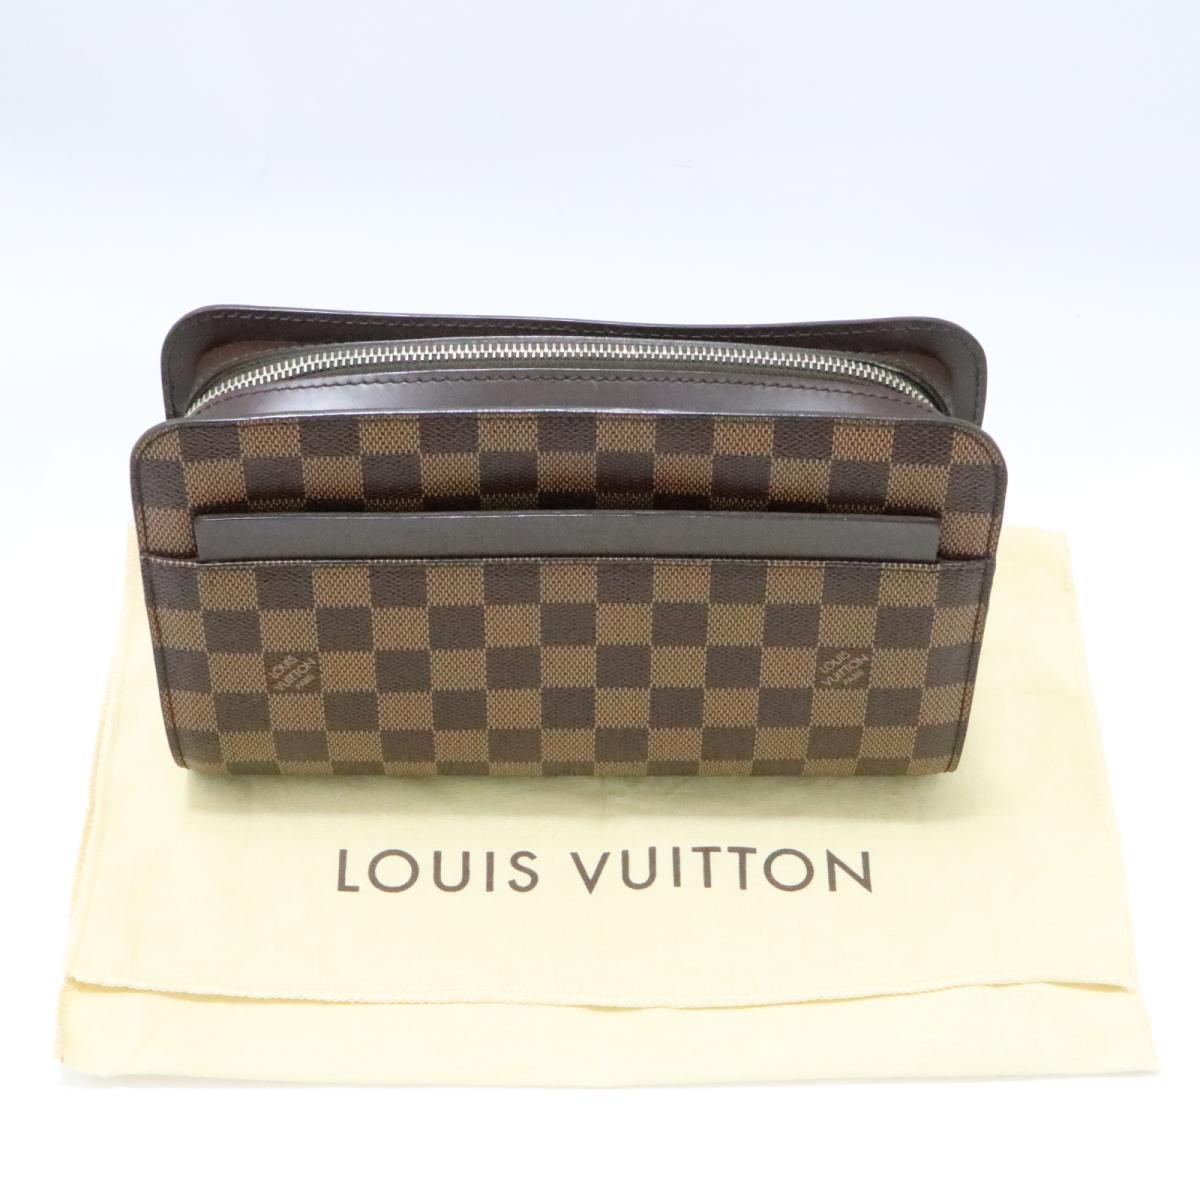 98004bc0a9 ... Auth LOUIS VUITTON Saint Louis Shoulder Bag N51993 Damier Used Vintage  | BRANDOFF Ginza/TOKYO